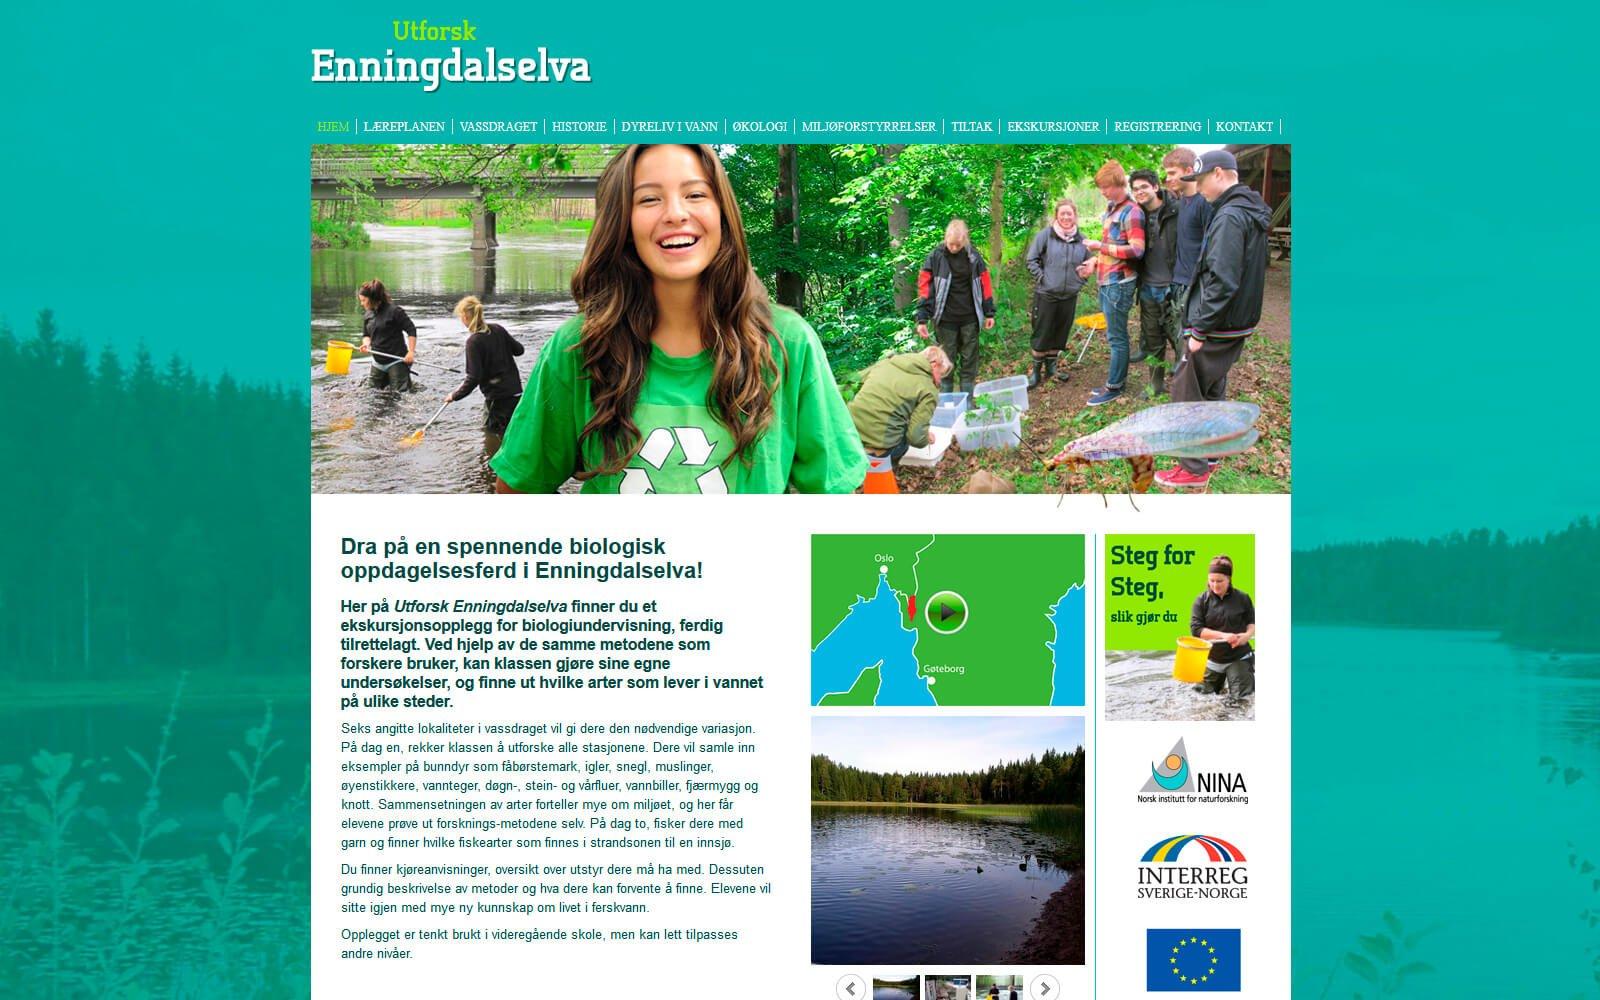 Enningdalselva webside